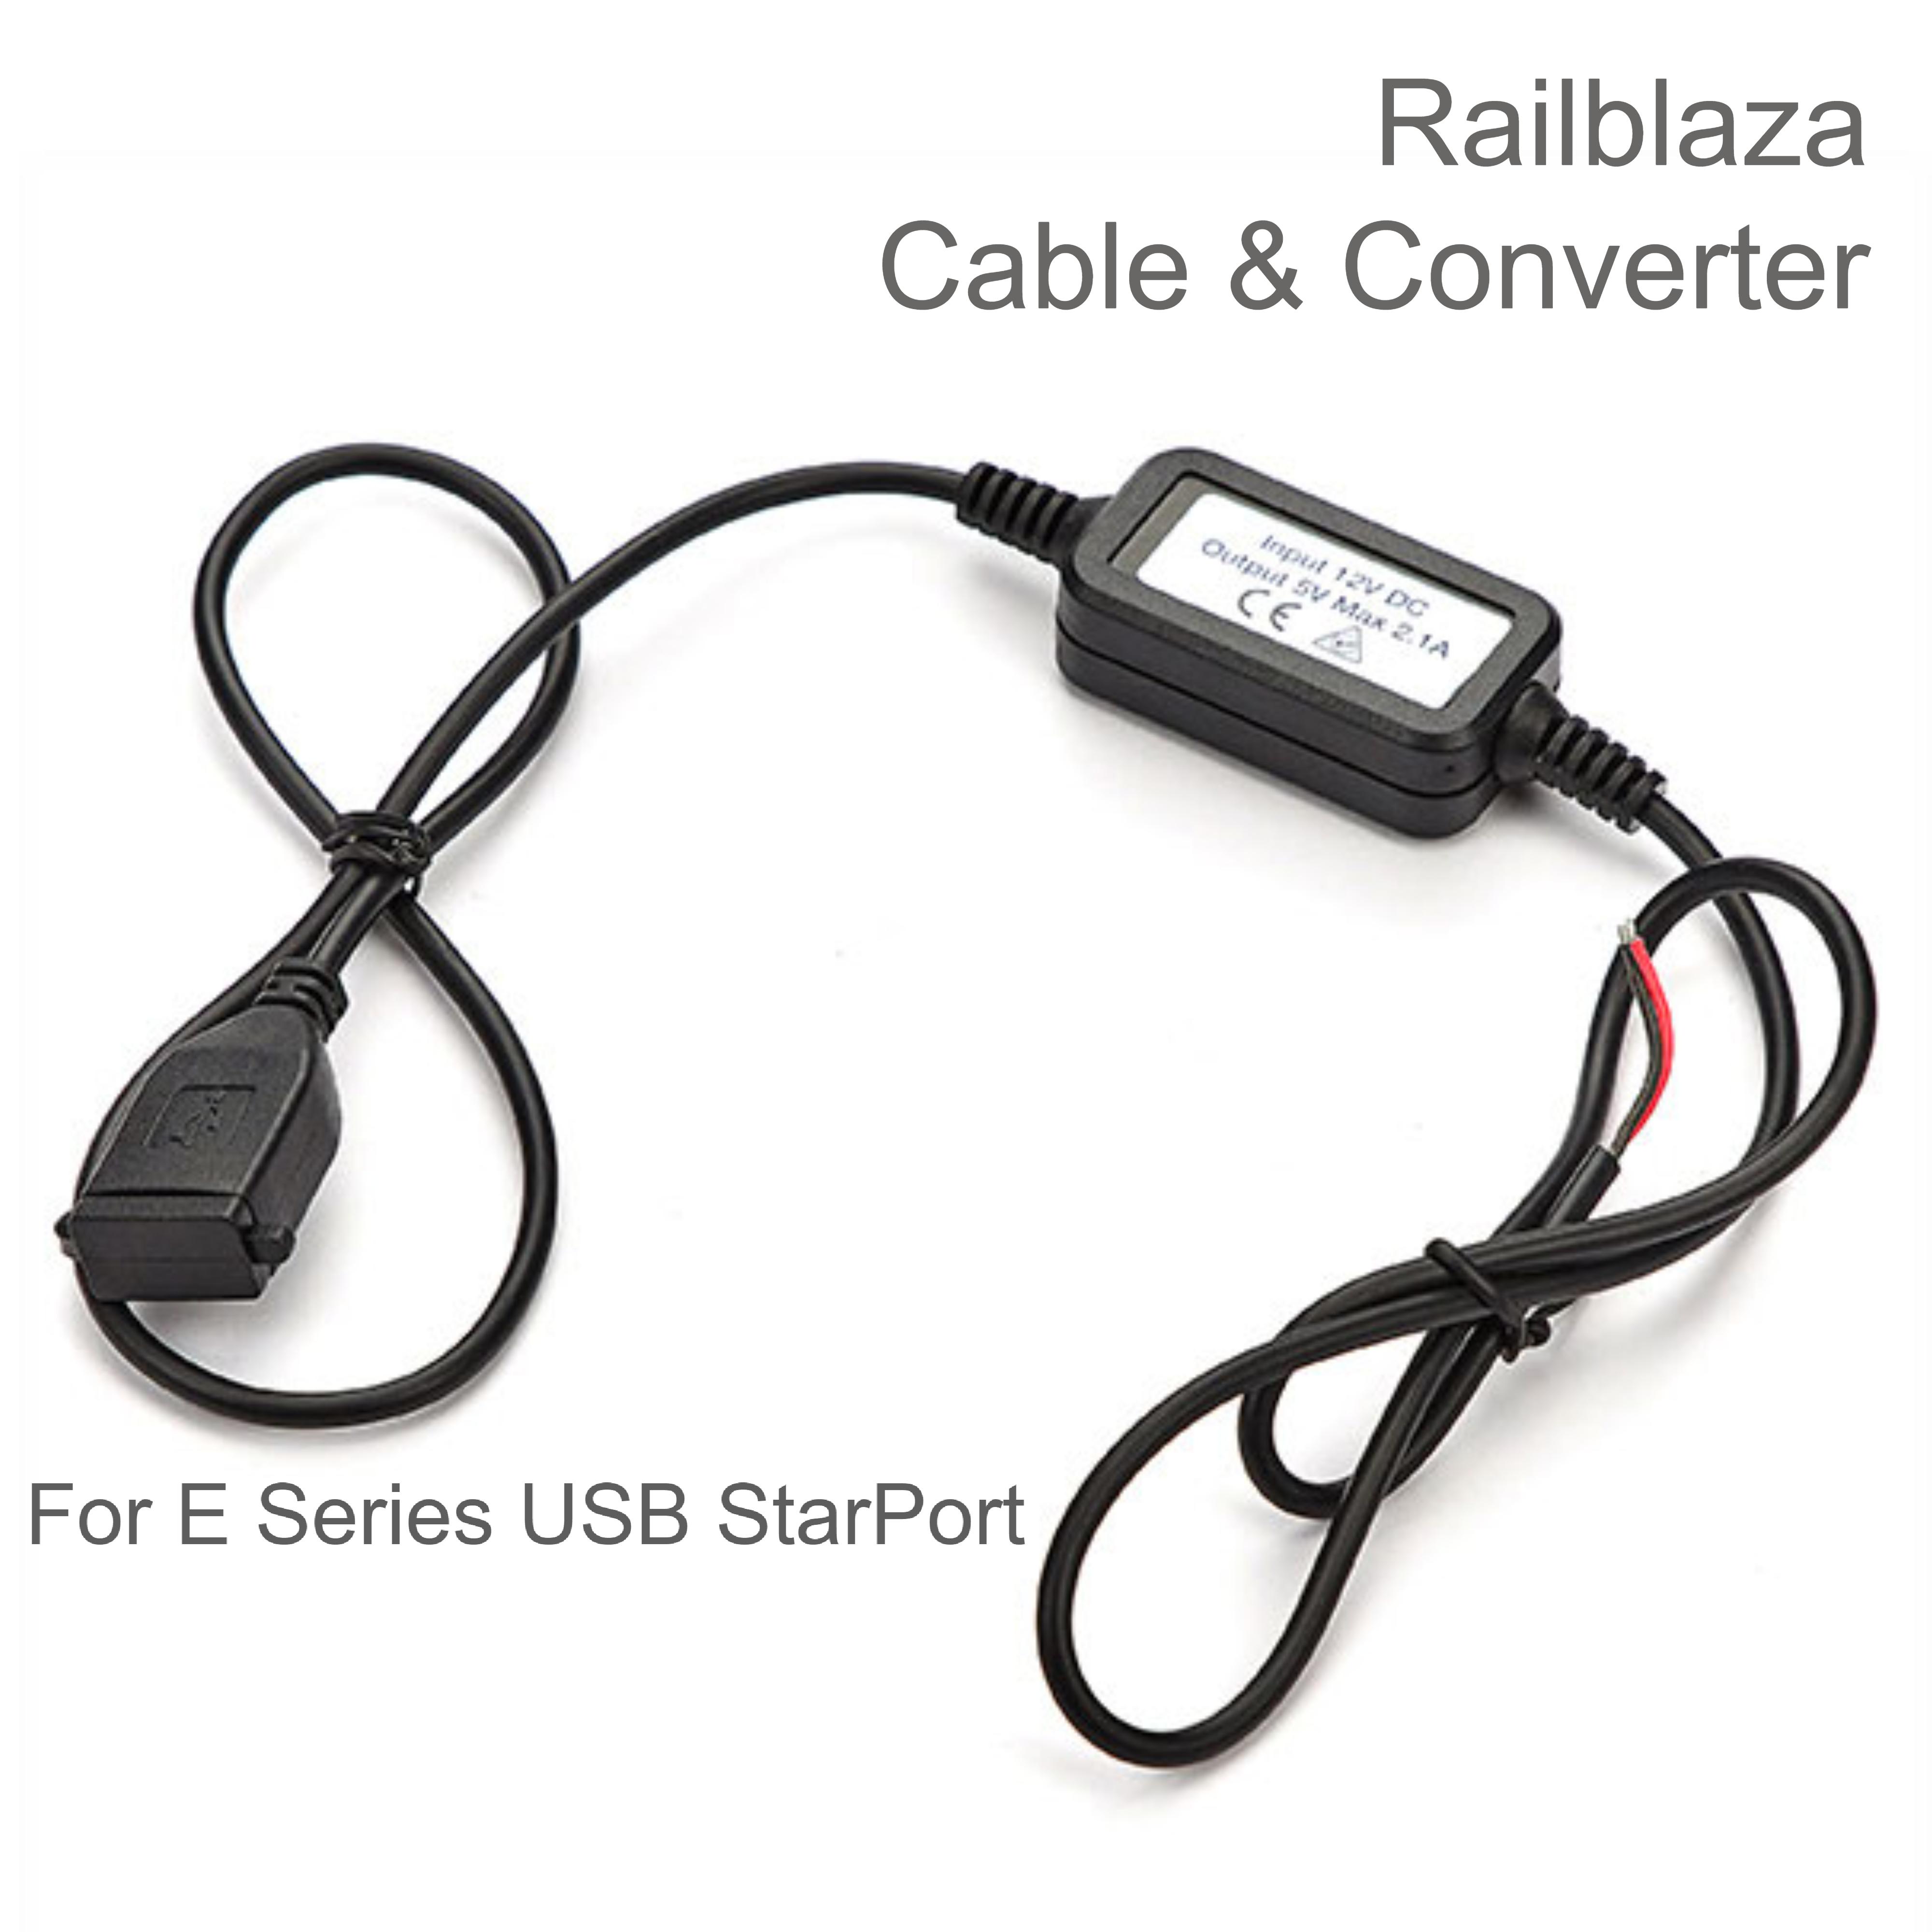 Railblaza Cable Set & Converter for E Series USB StarPort | For Boat & Kayak